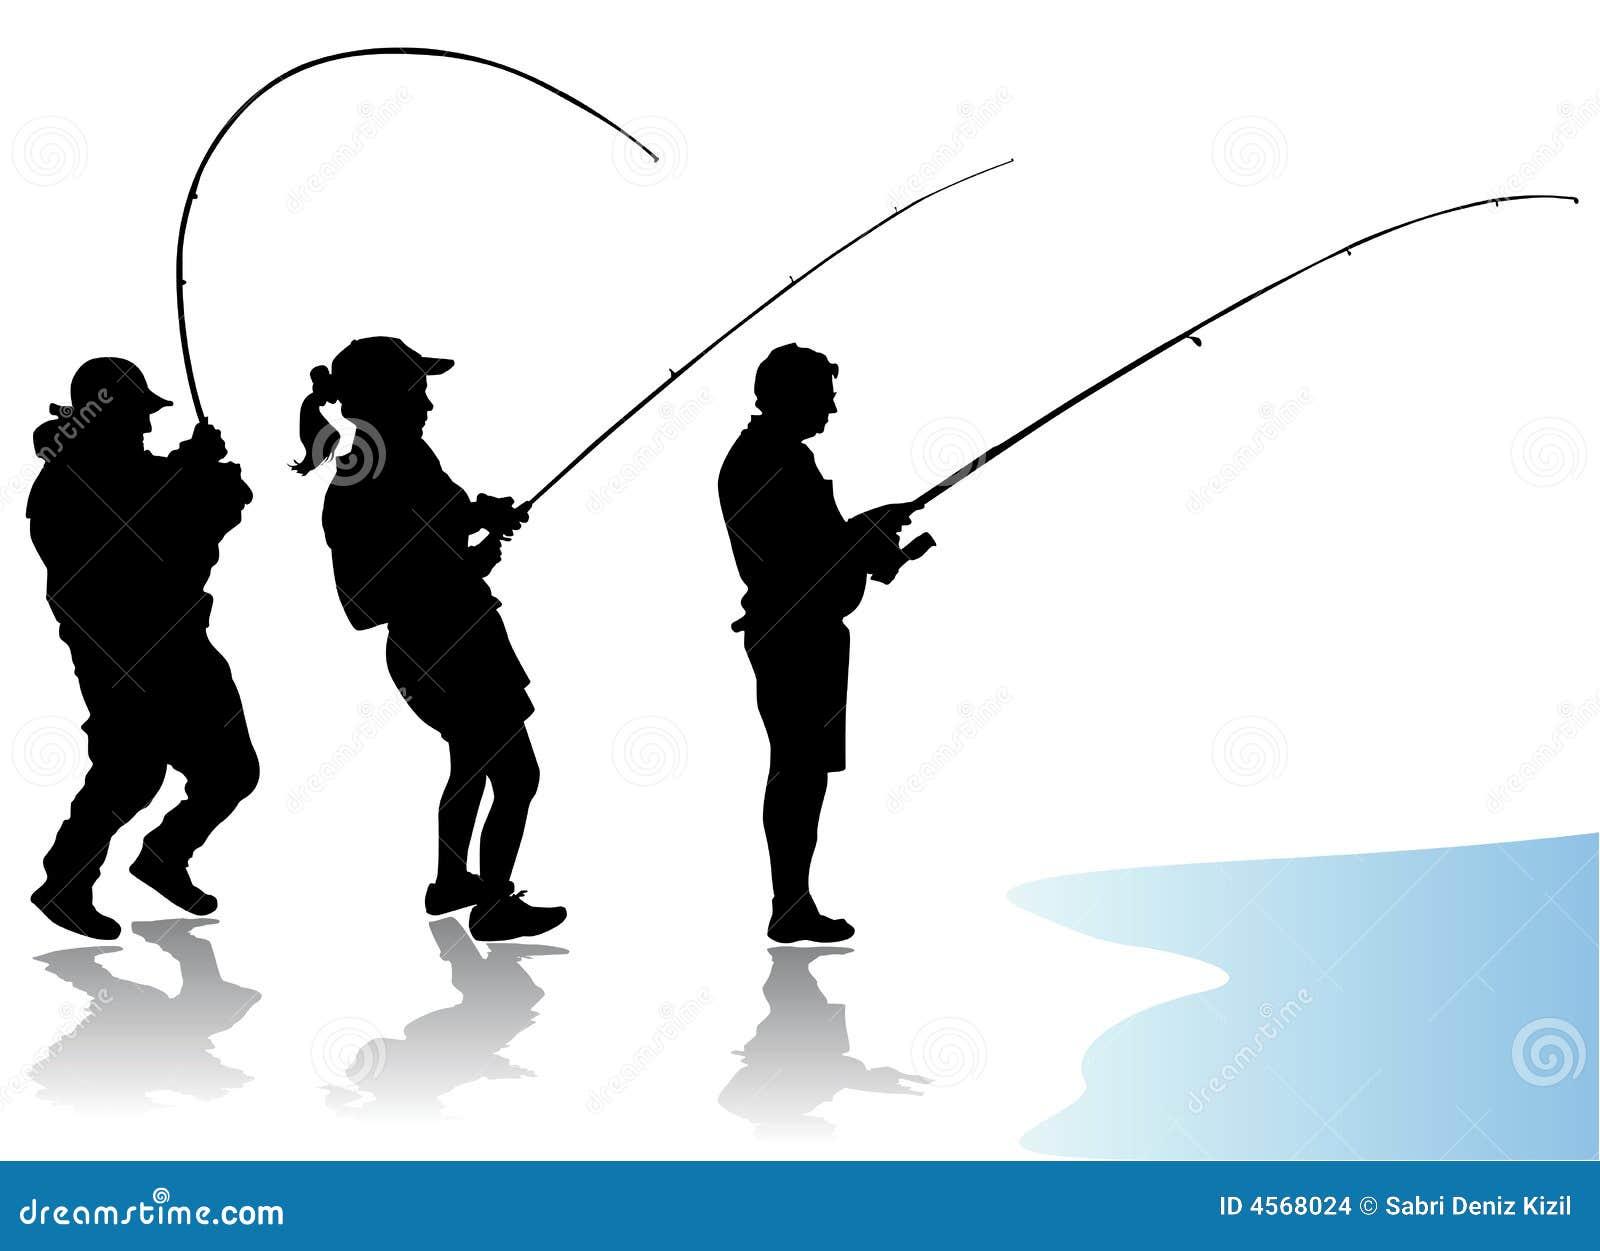 Rain Coat Clip Art Vetor Do Pescador Imag...